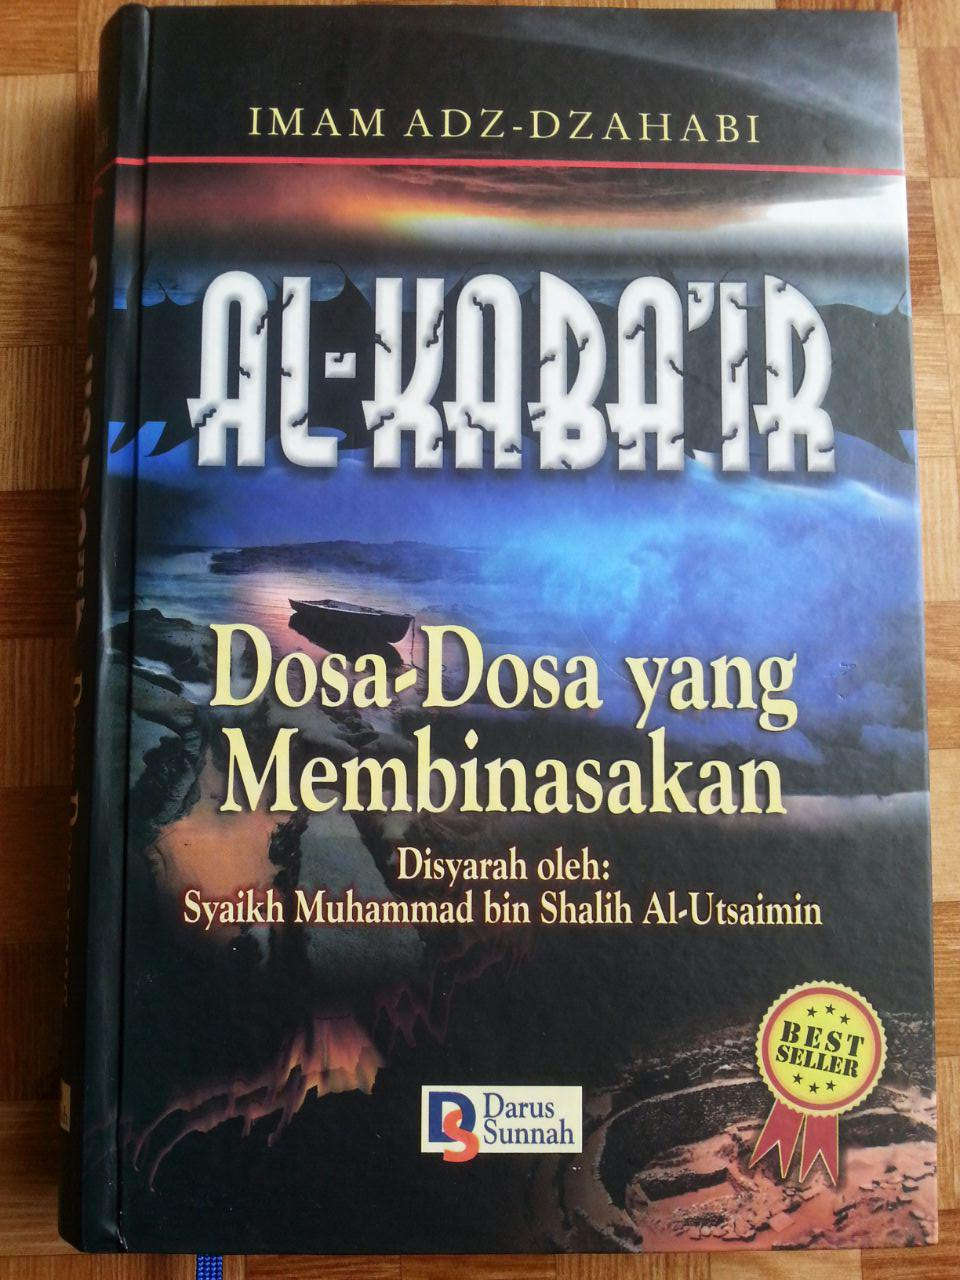 Buku Al-Kaba'ir Dosa-Dosa Yang Membinasakan cover 2